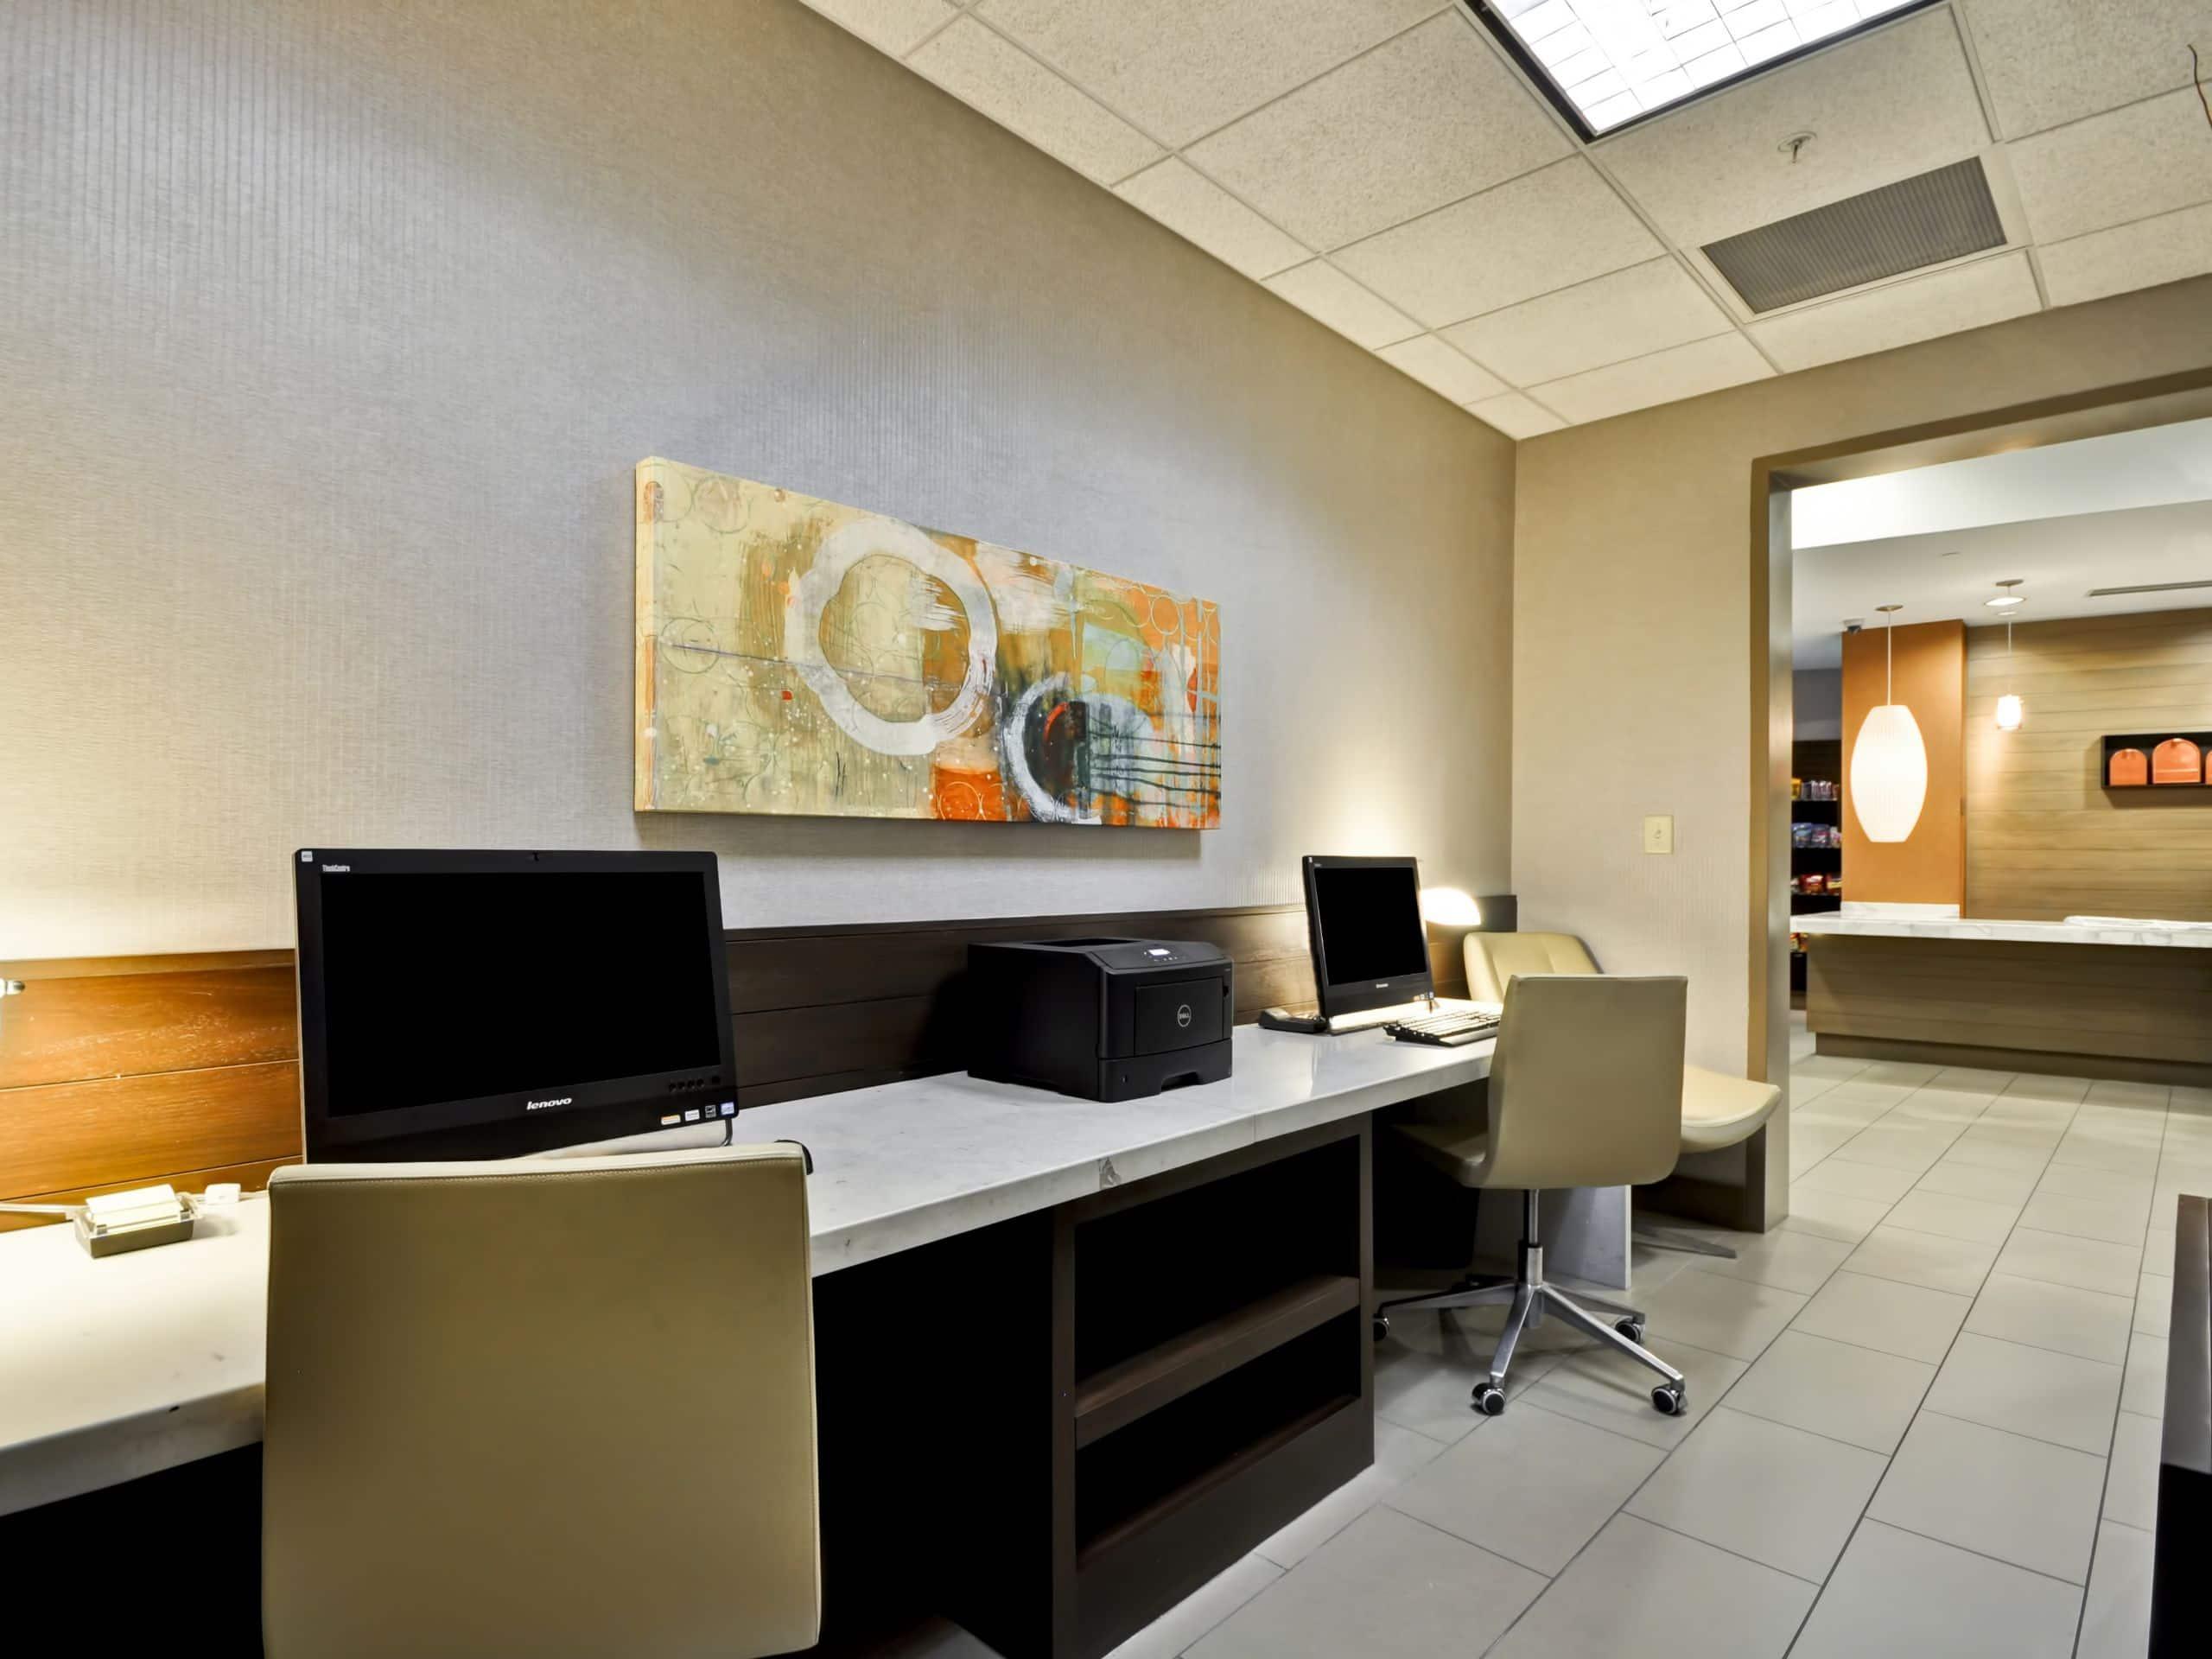 8869417e608 Extended Stay Hotel near Cobb Galleria